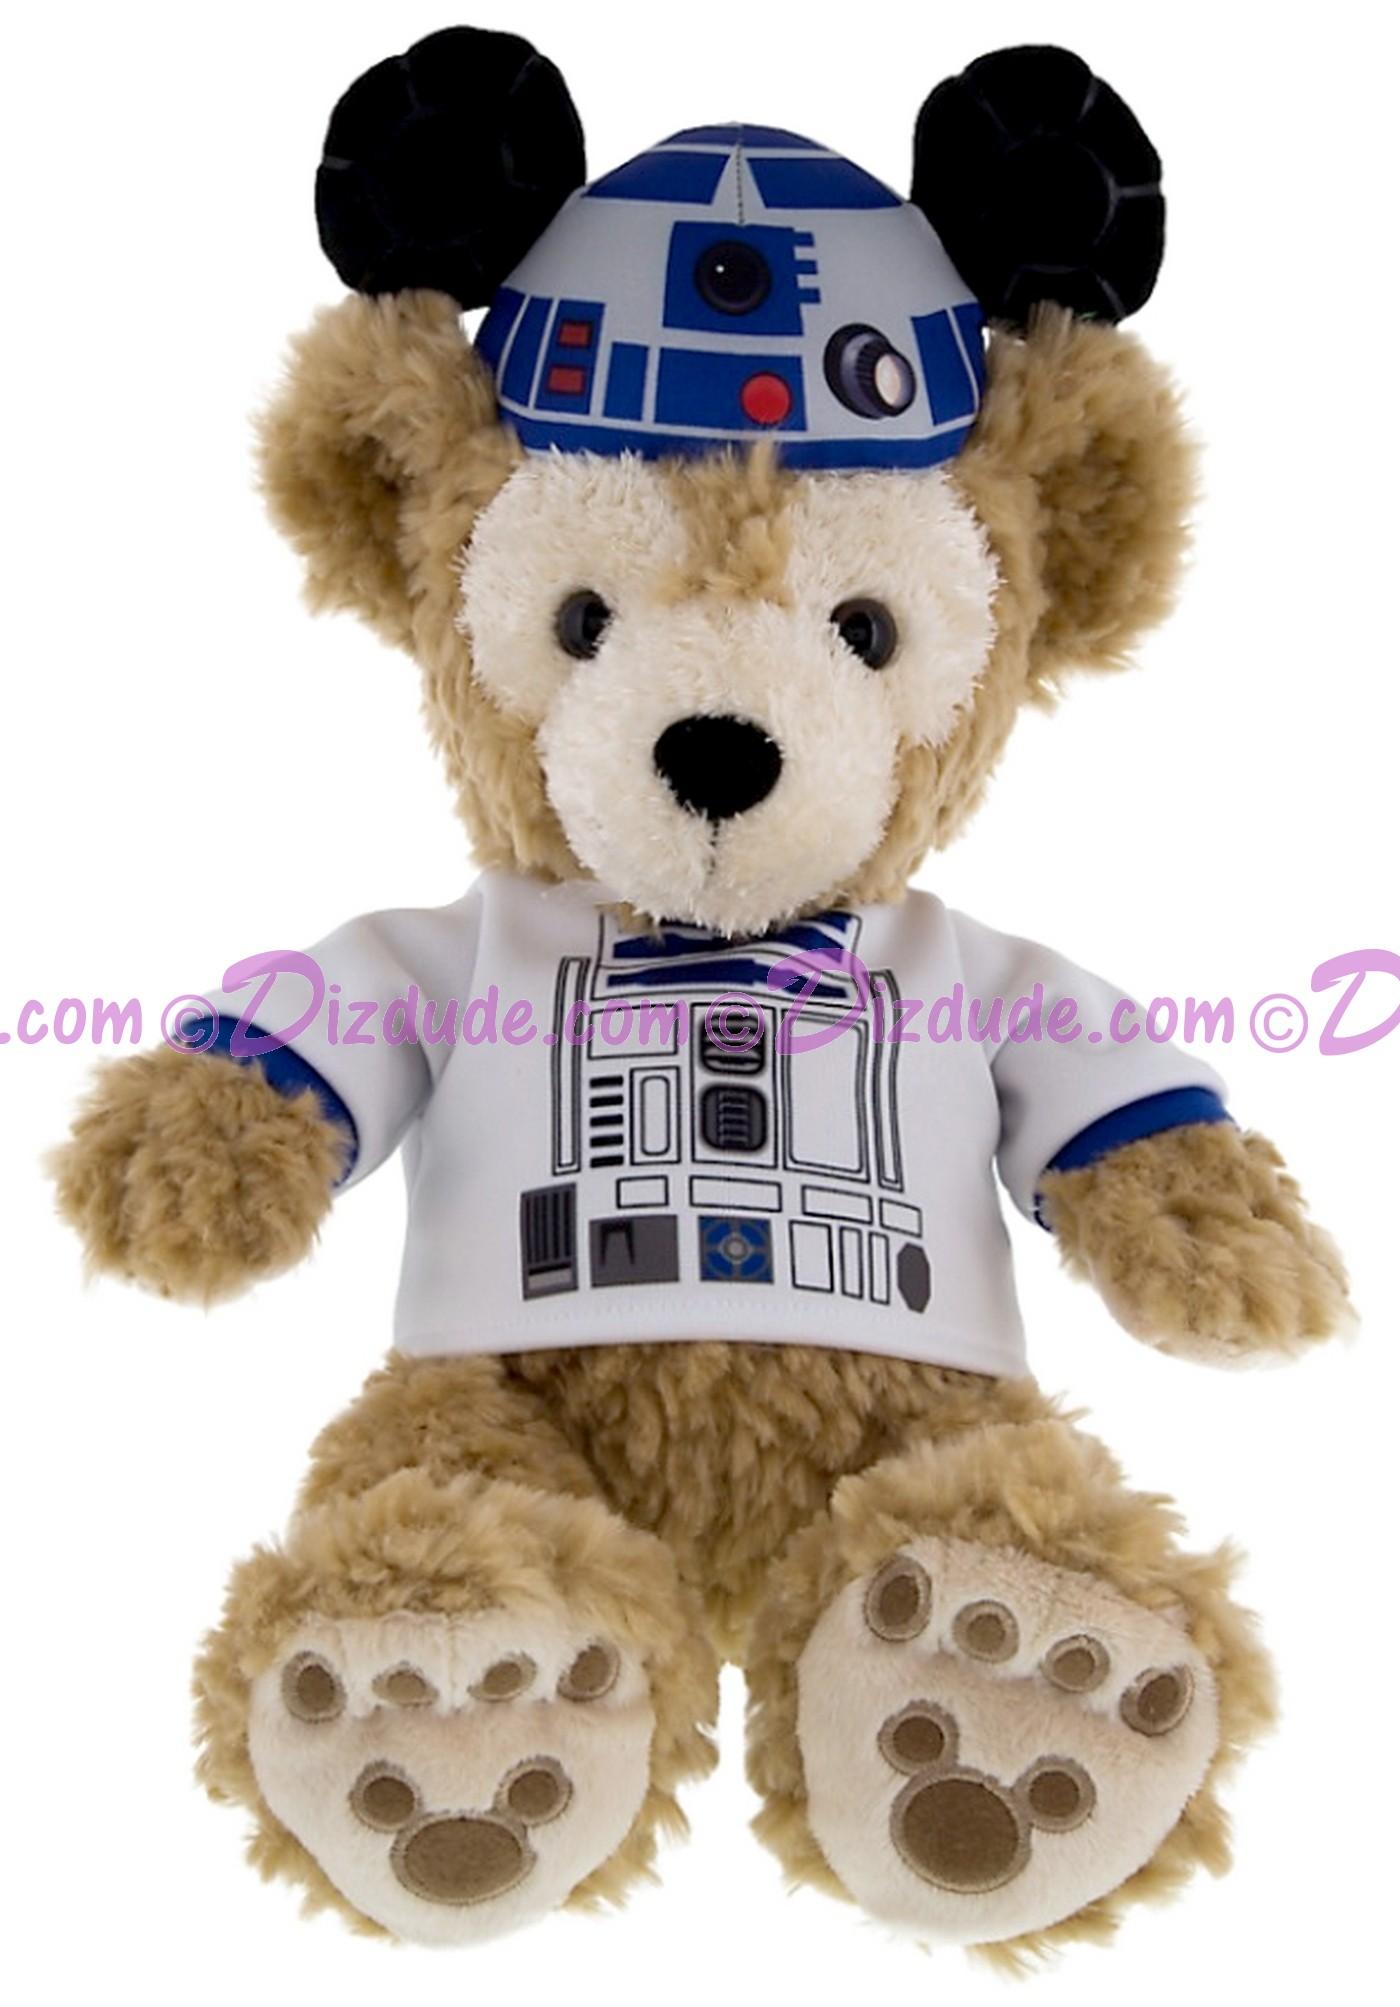 R2-D2 Duffy The Disney Bear Predressed 12 inch Plush Toy © Dizdude.com